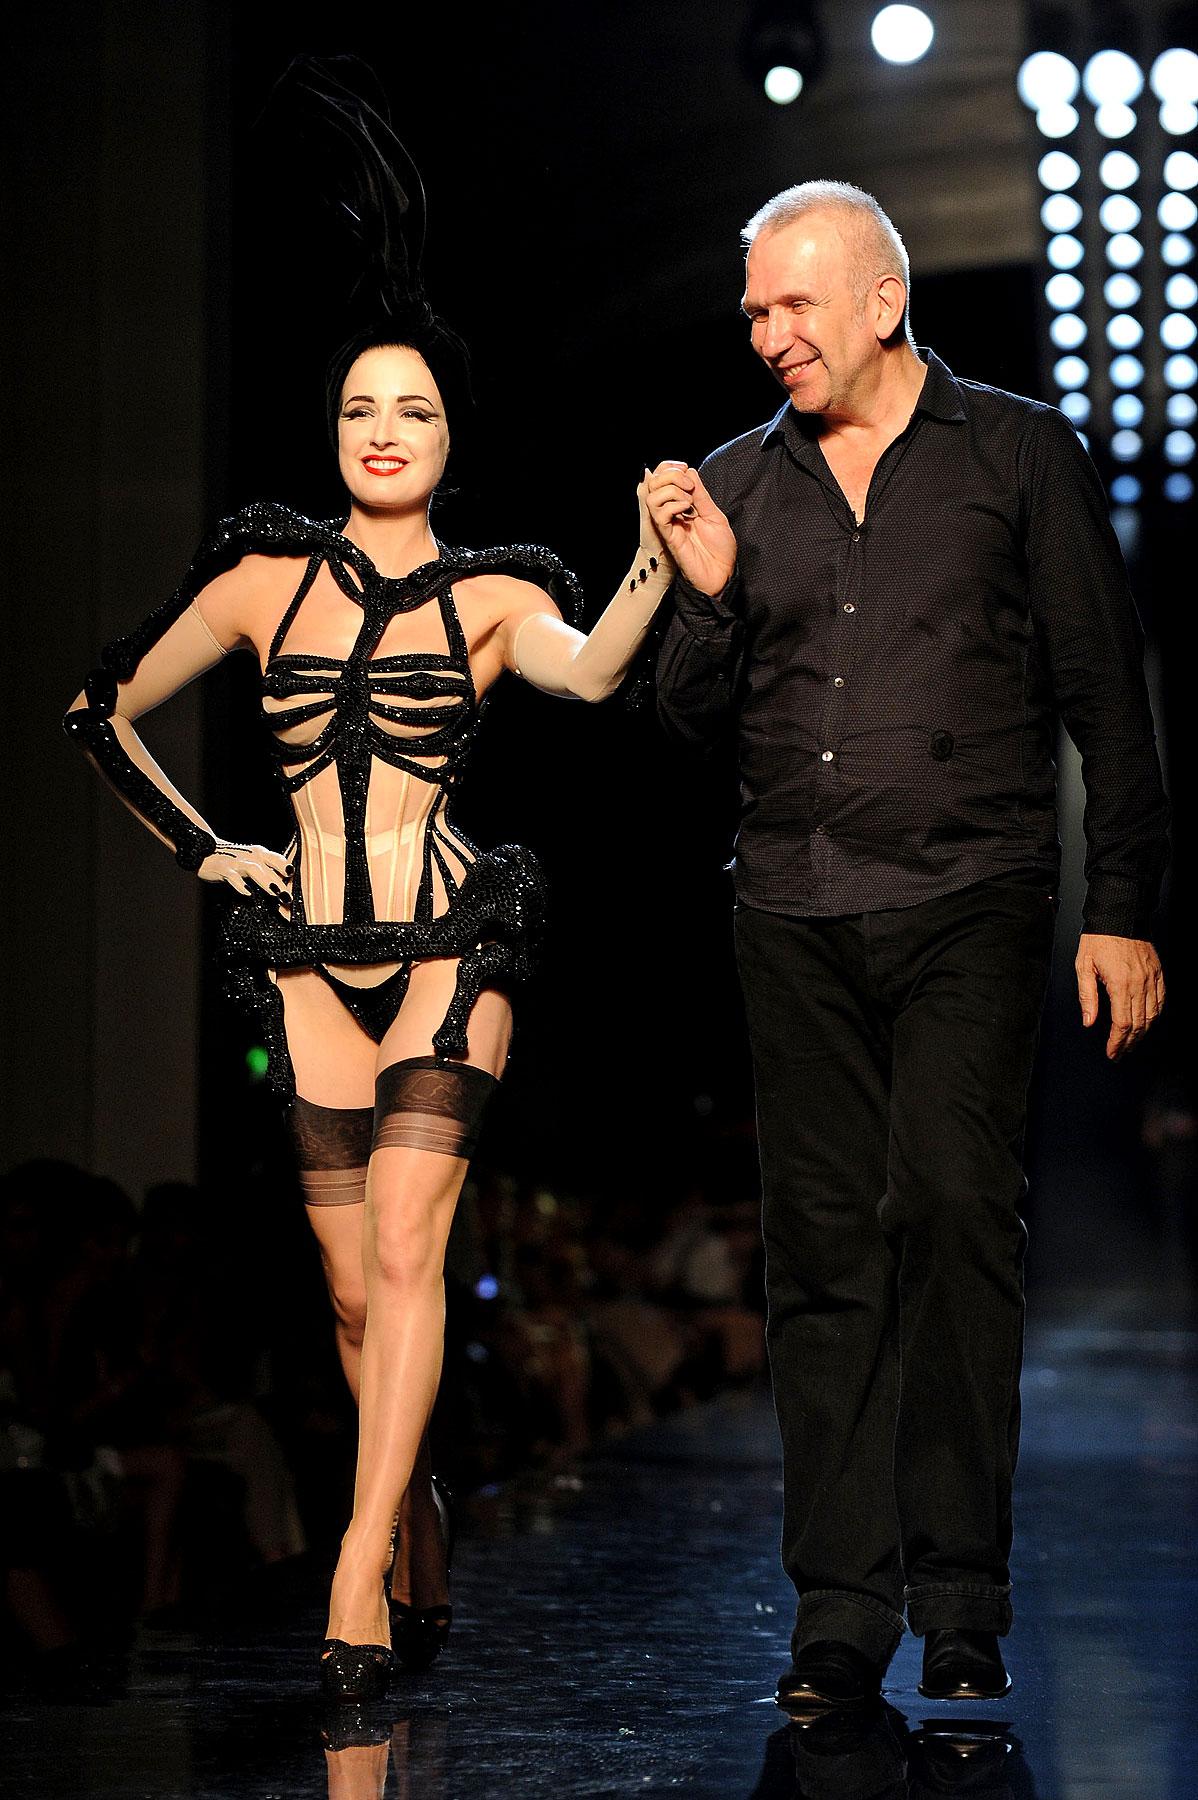 Dita Von Teese Shows Some Skin for Fashion Week (PHOTOS)